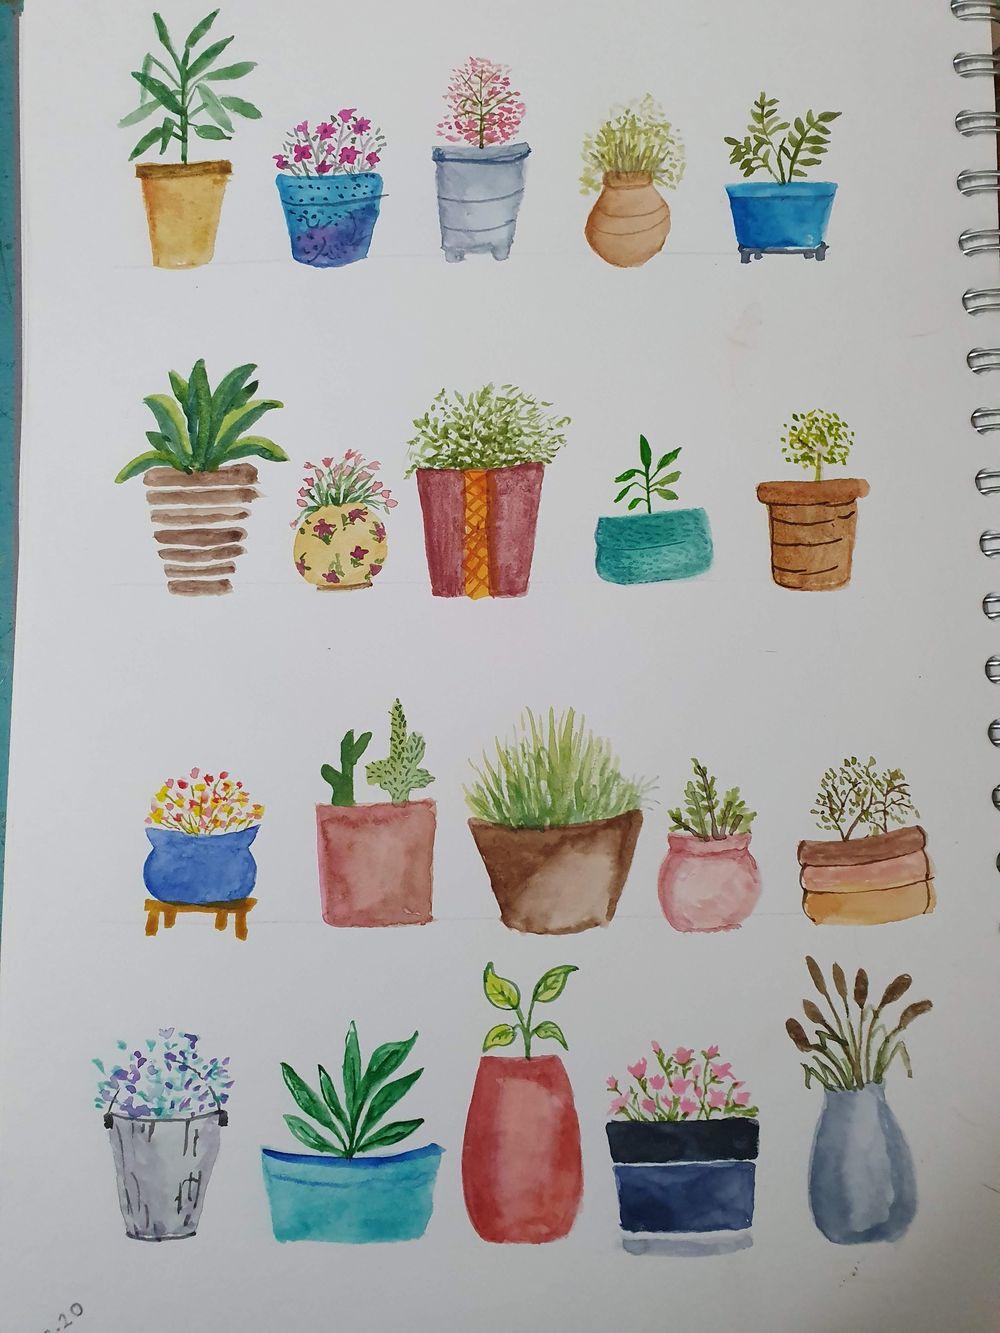 Pots - image 1 - student project